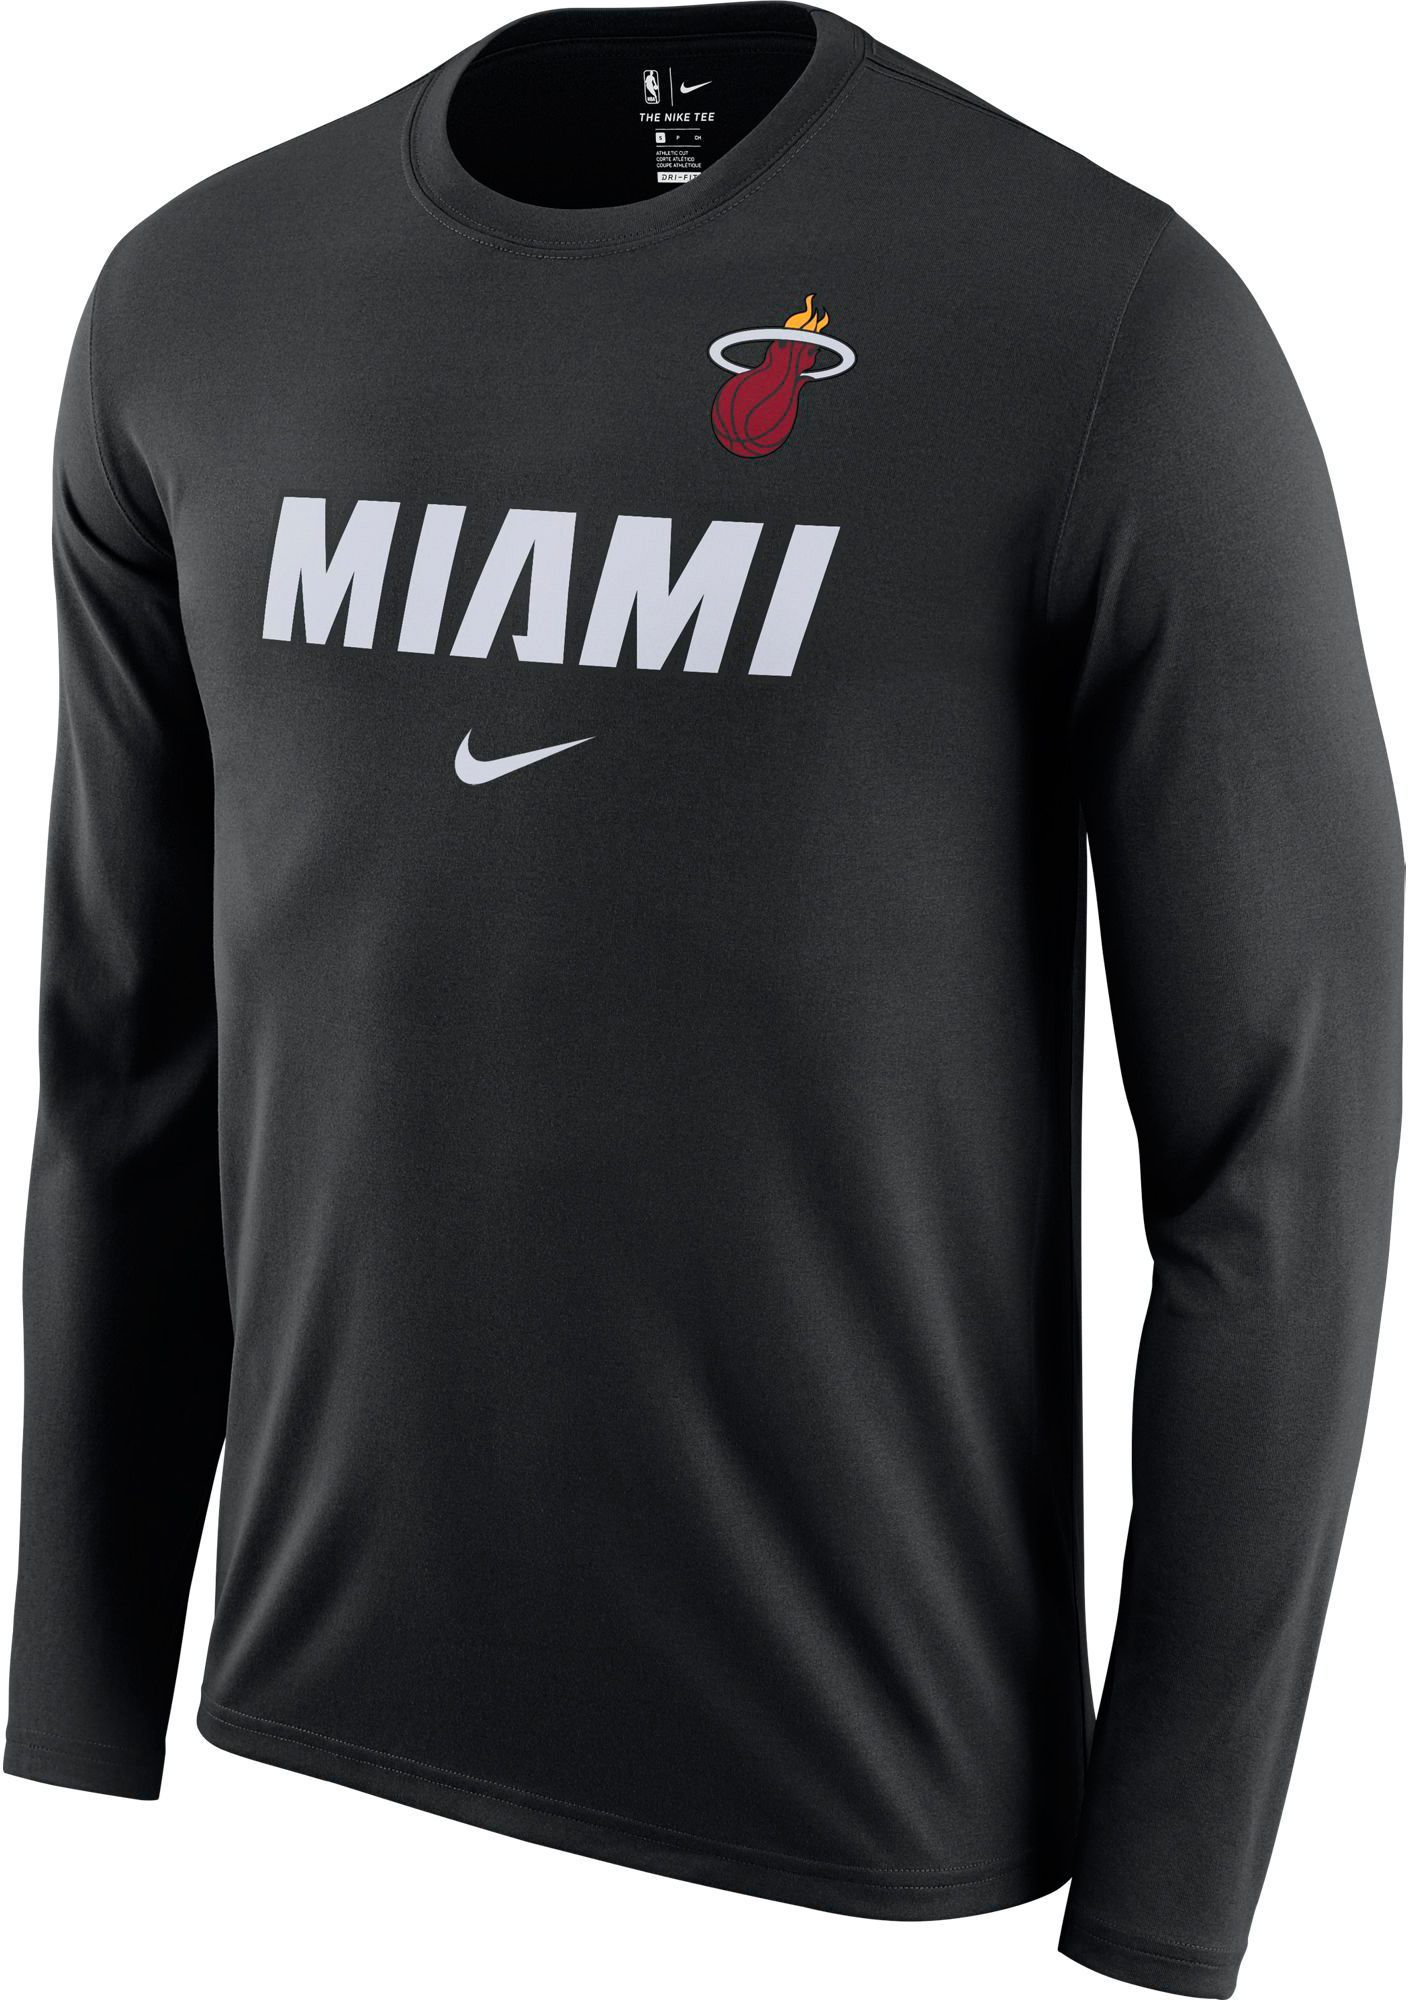 big sale 8cb62 cd881 Nike Men's Miami Heat Dri-FIT Facility Long Sleeve Shirt ...